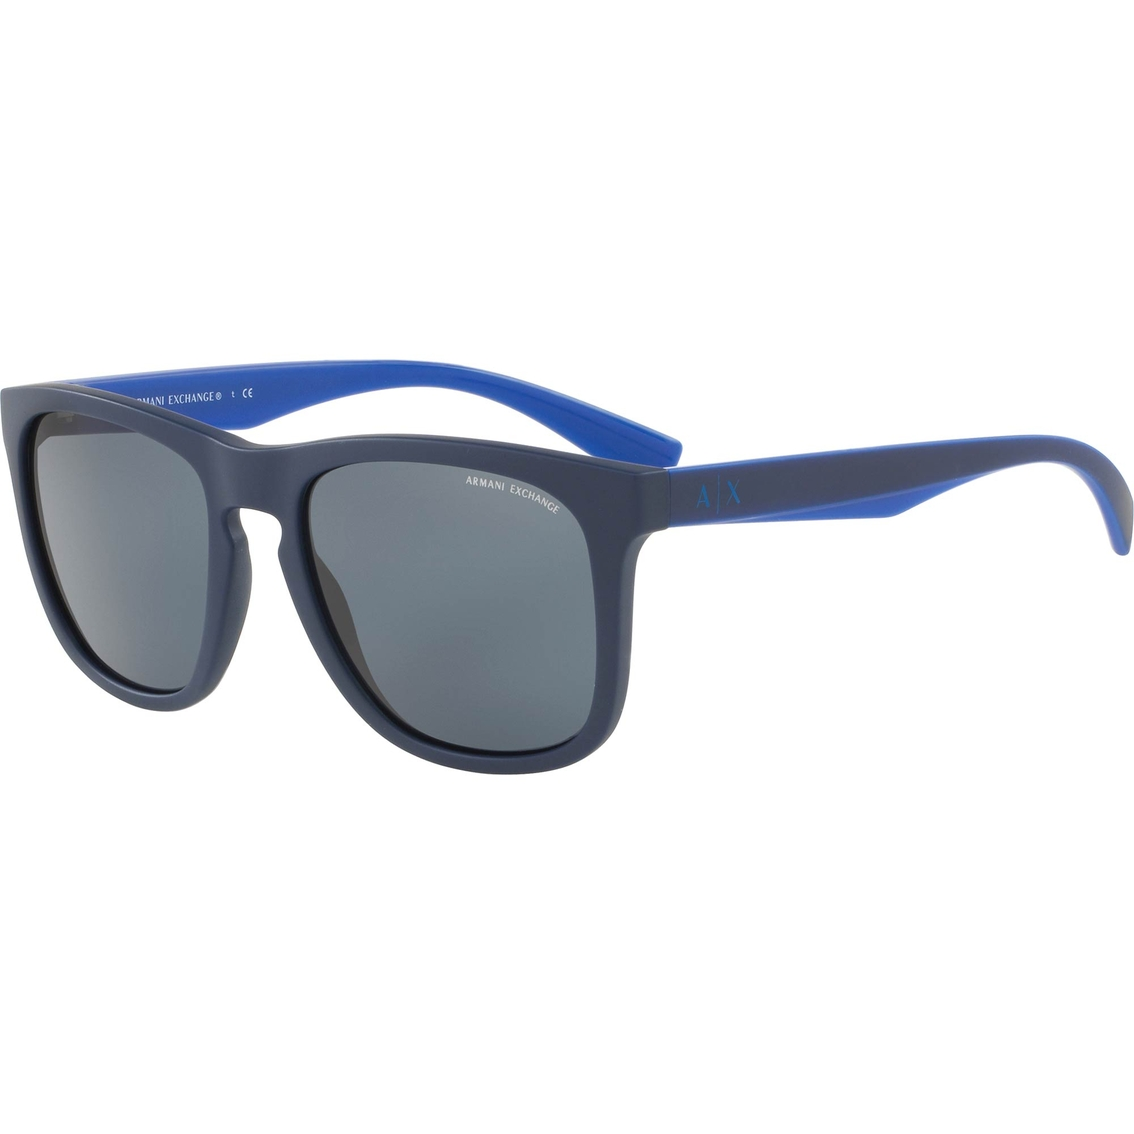 a6b5cfc5c0 Armani Exchange Sunglasses 0ax4058s | Men's Sunglasses | Handbags ...